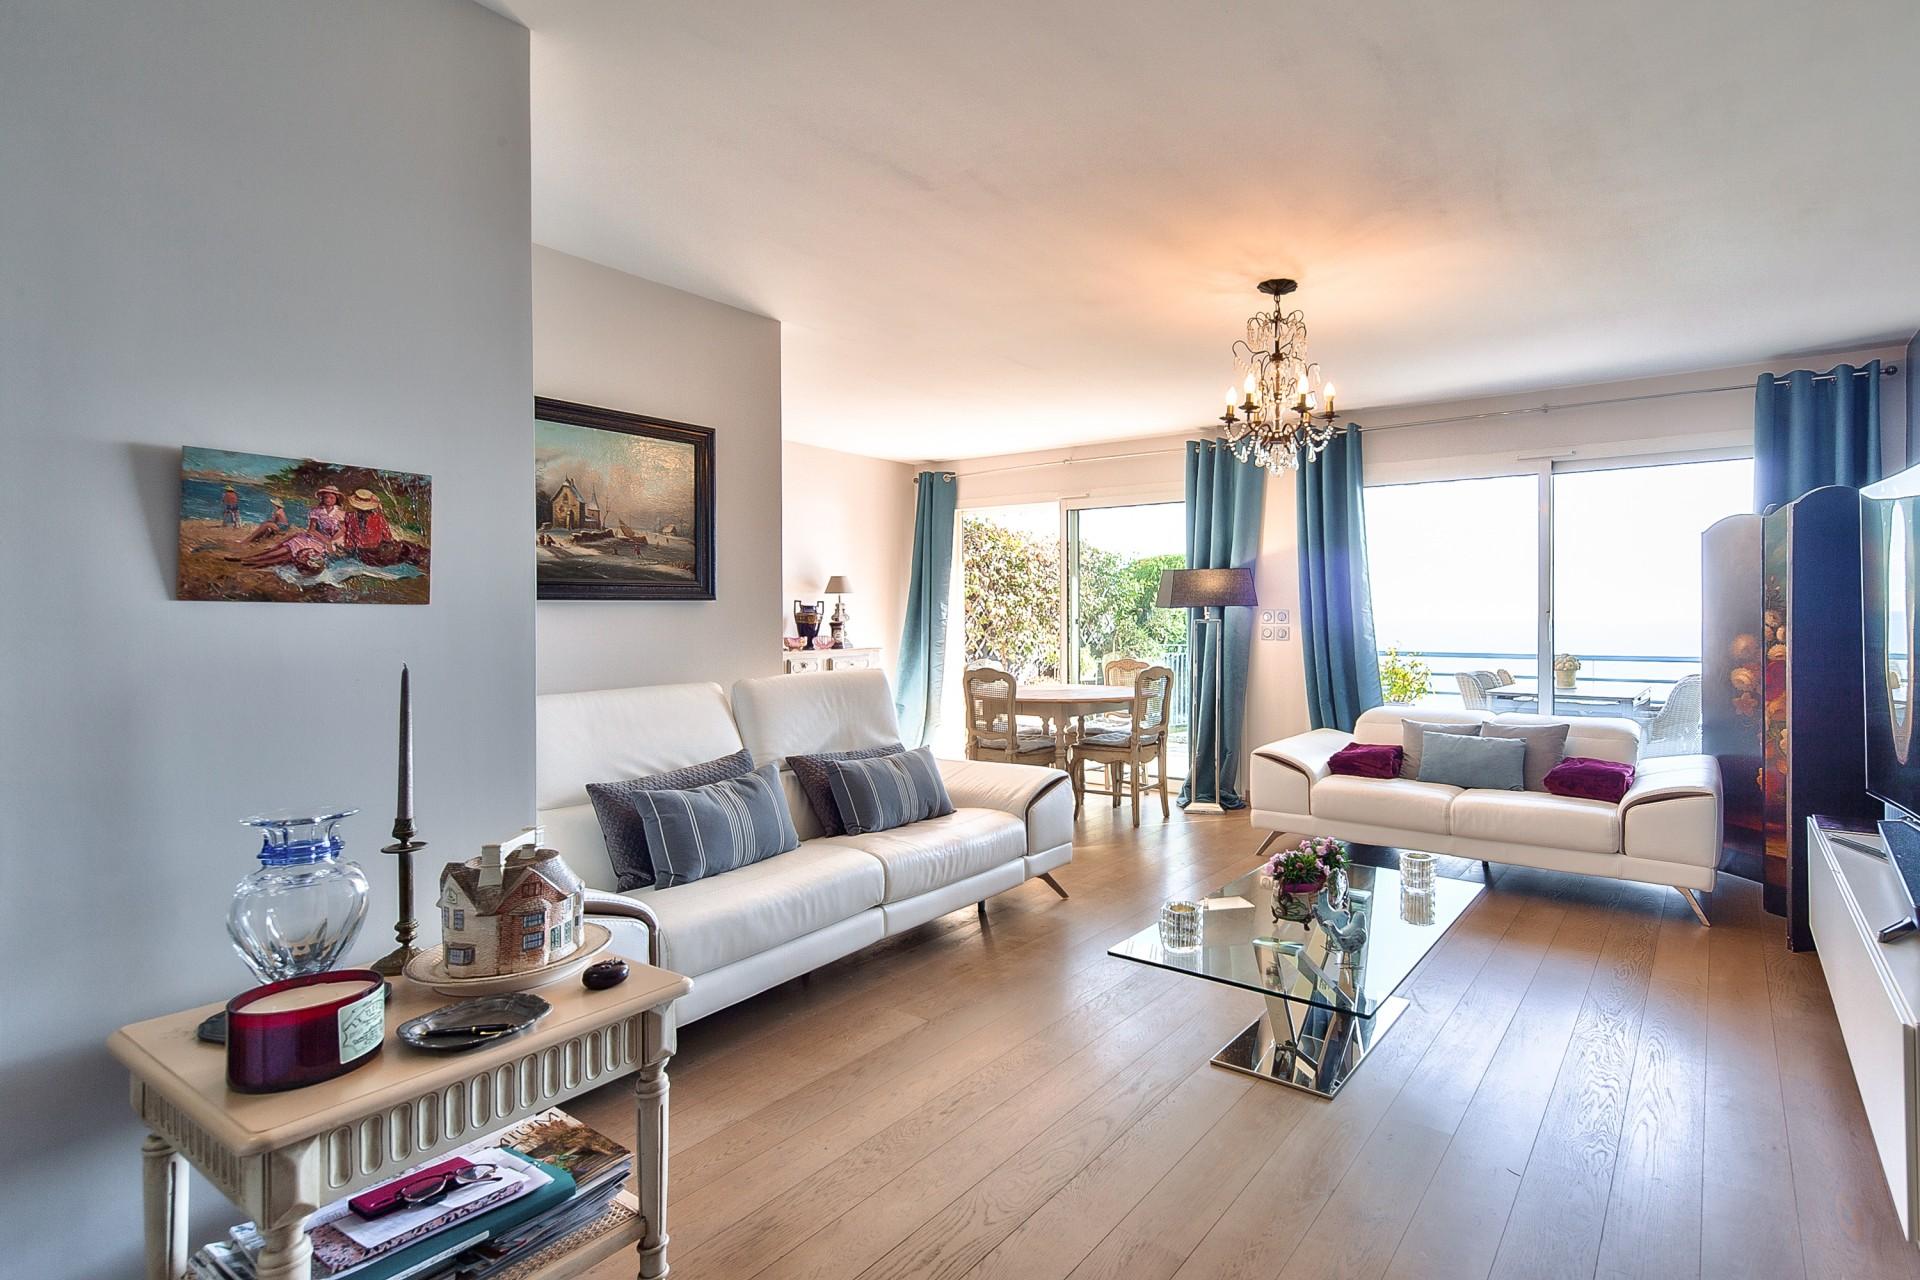 Roquebrune-Cap-Martin Exceptional Sea Views apartment with private garden